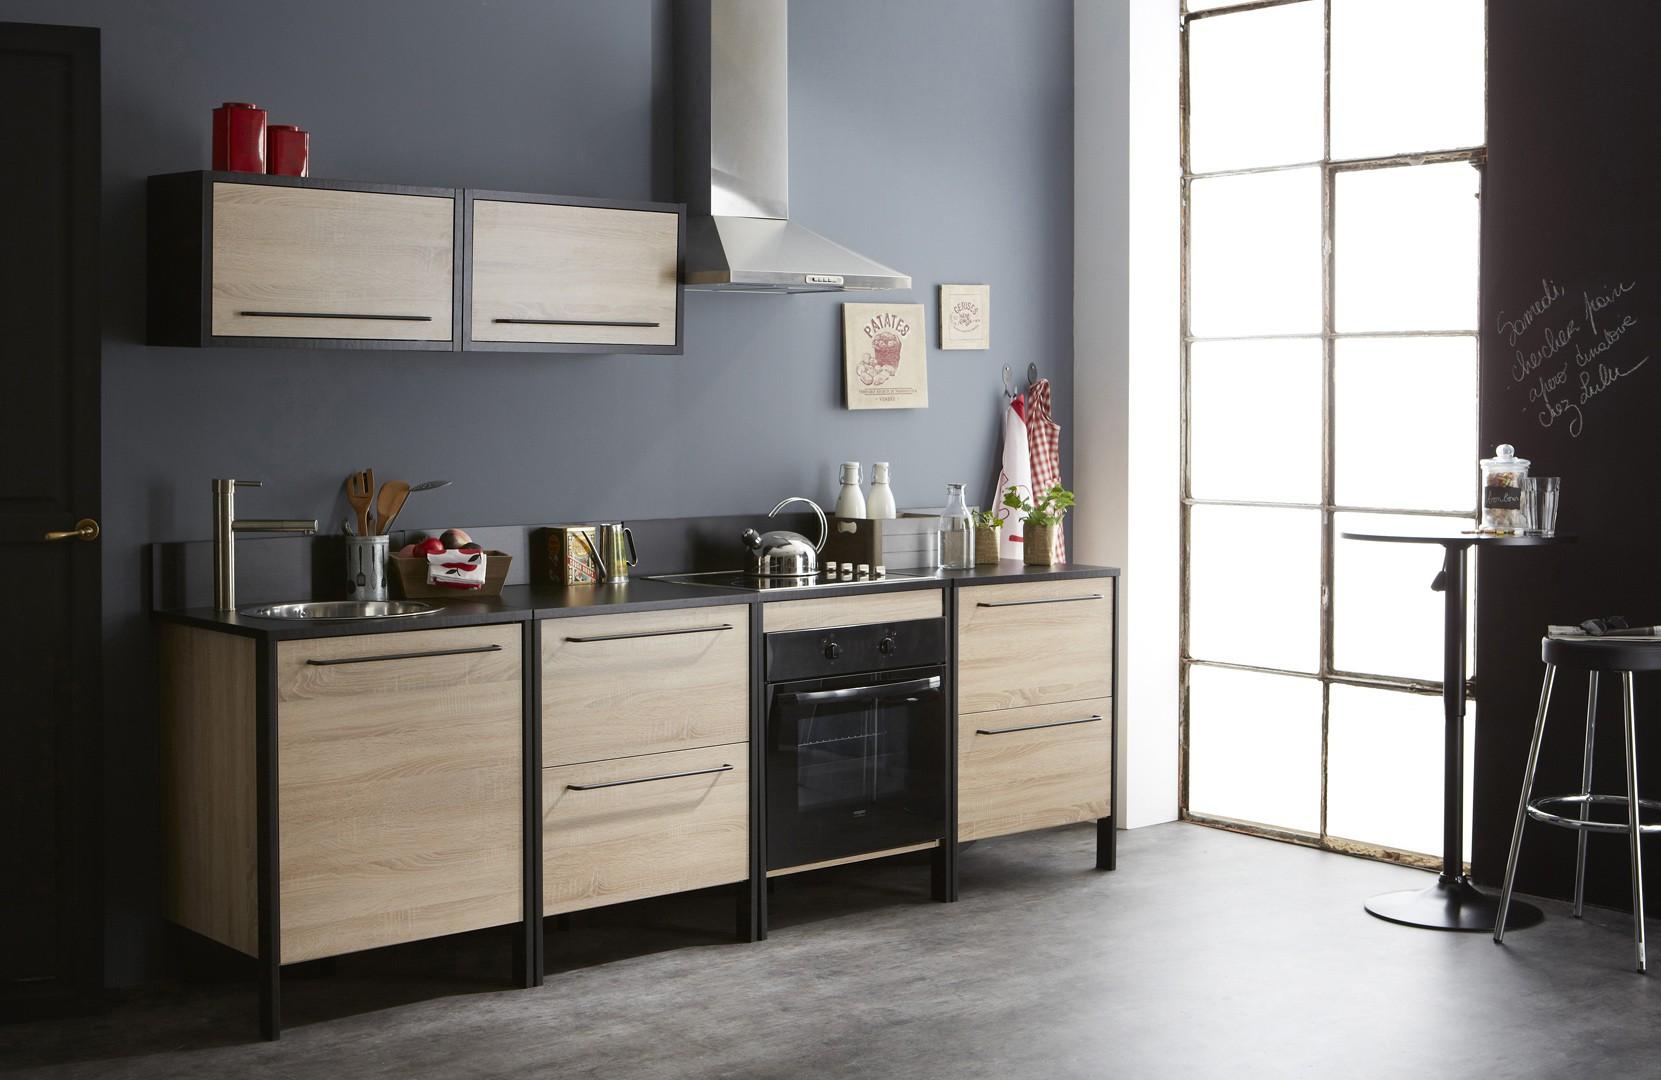 Meuble de cuisine avec table escamotable maison et - Meuble cuisine avec table escamotable ...